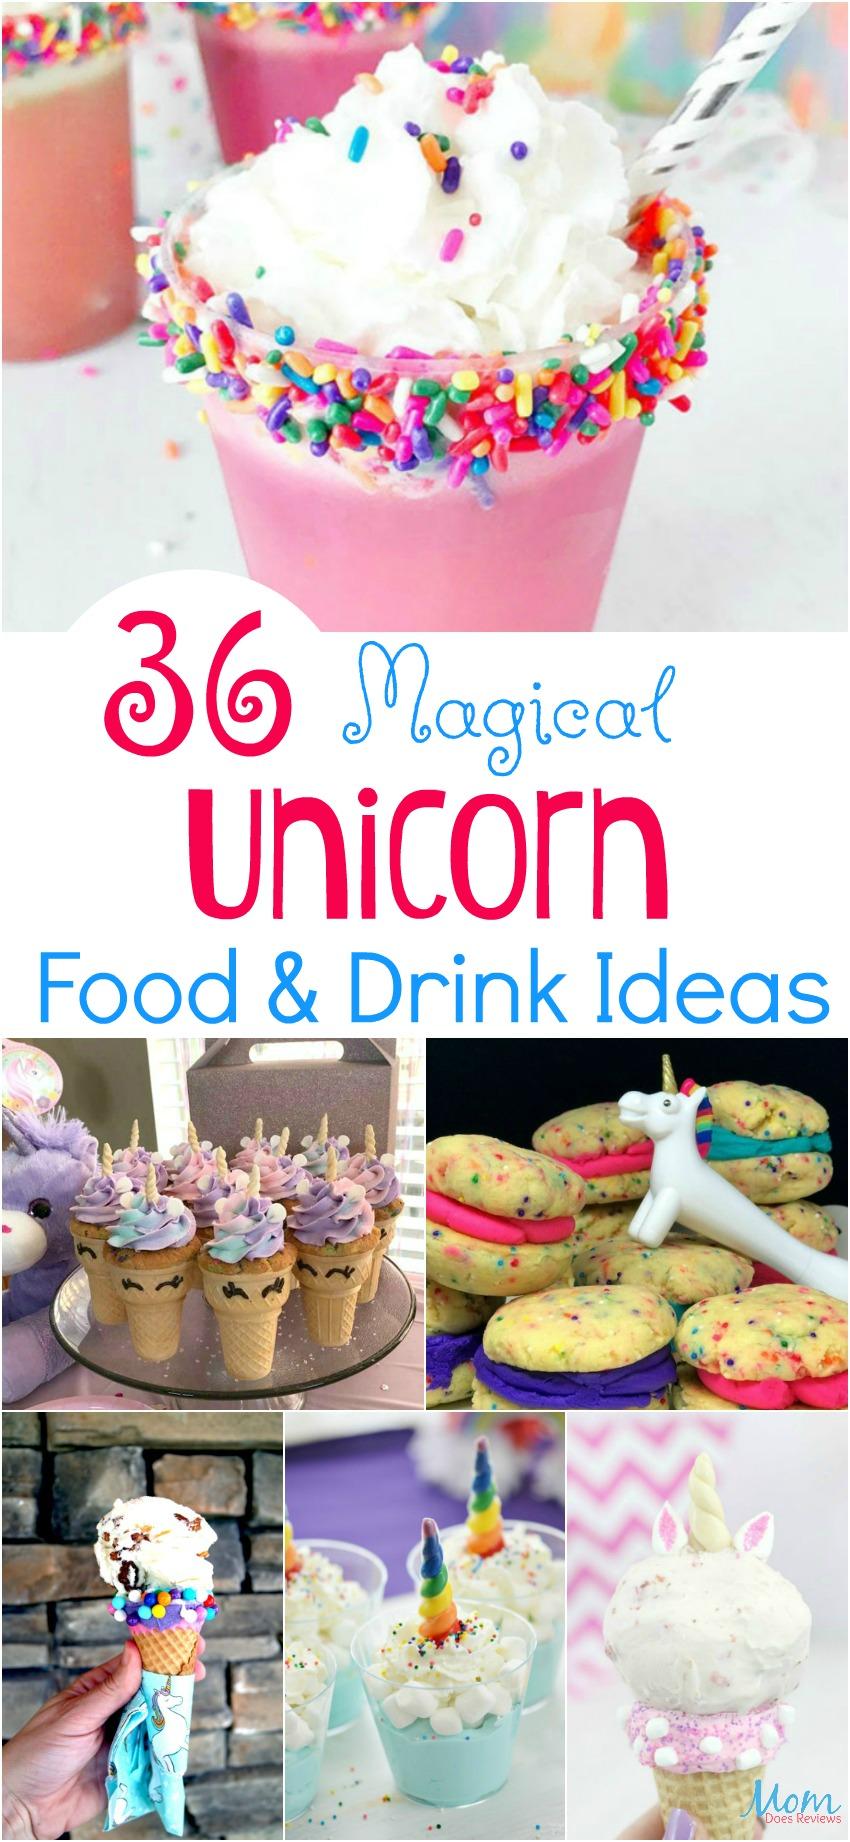 36 Magical Unicorn Food & Drink Ideas Guaranteed to Make You Smile